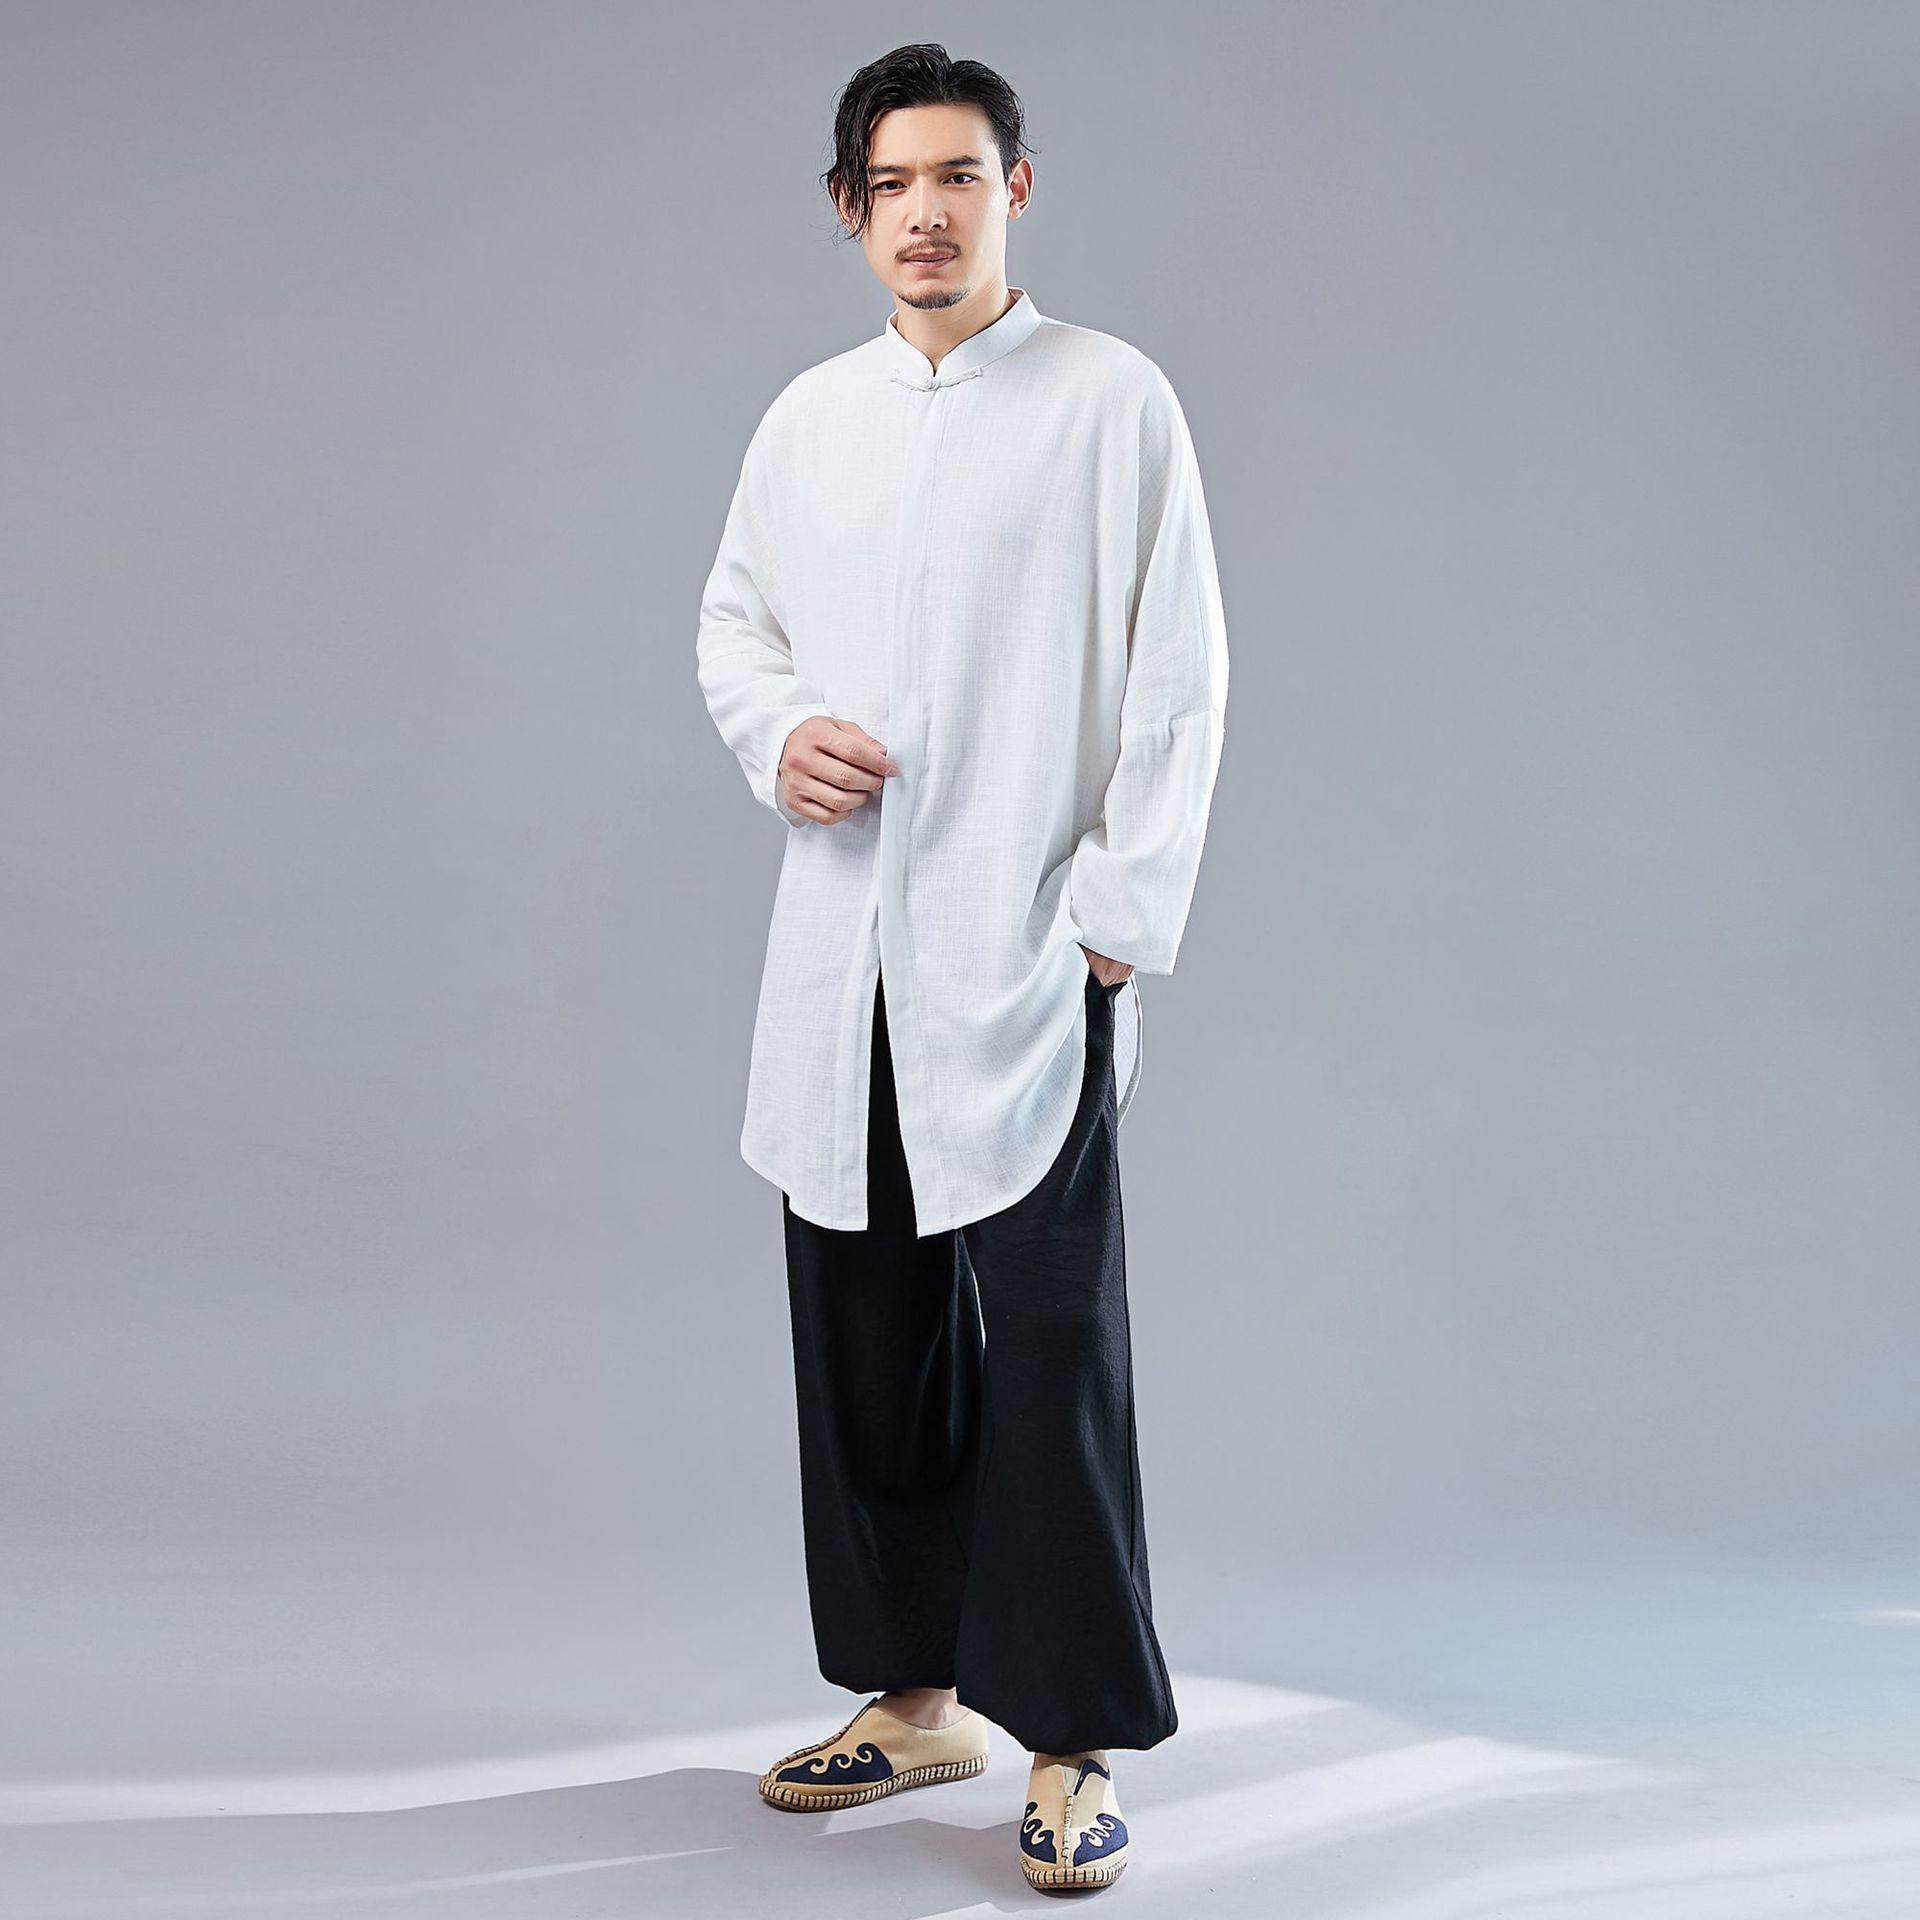 New Chinese Style Arc Bat Shirt Men's Clothing Creative Retro Personality Cardigan Installed xiu xian kuan Linen Meditation